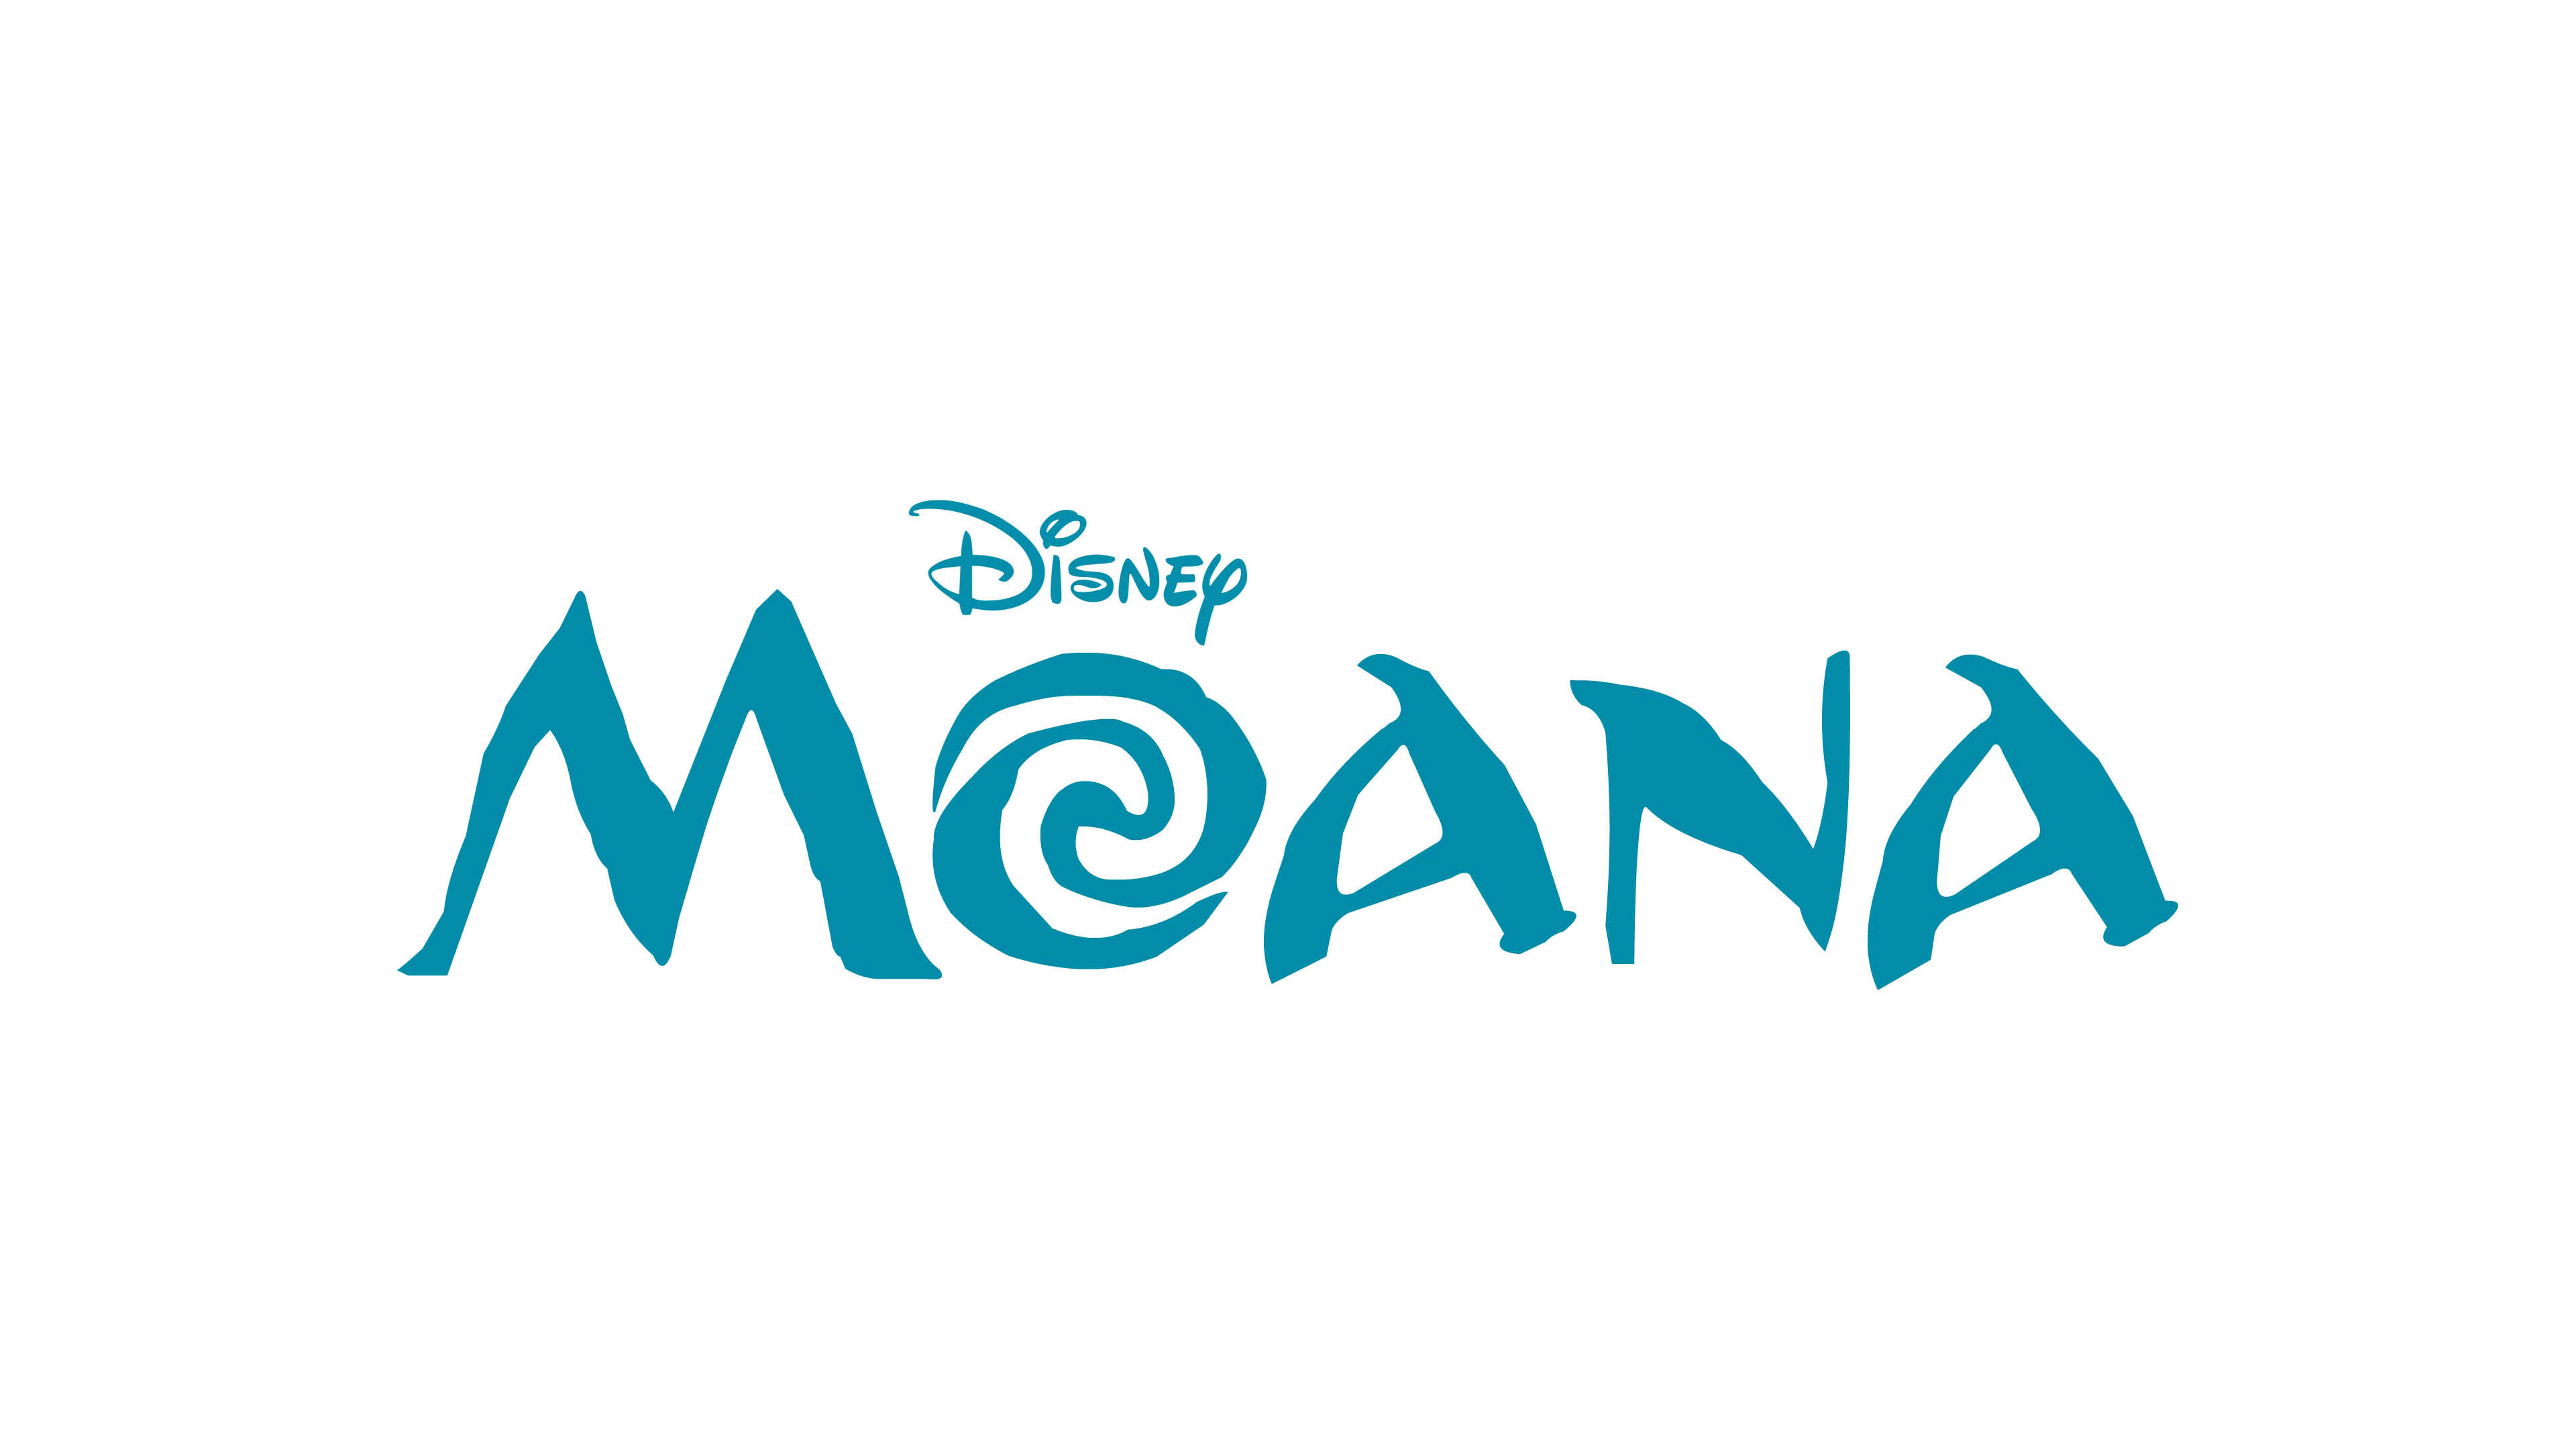 Disney Moana 4k Logo   3840x2160   4K 169 Ultra HD UHD 3840x2160